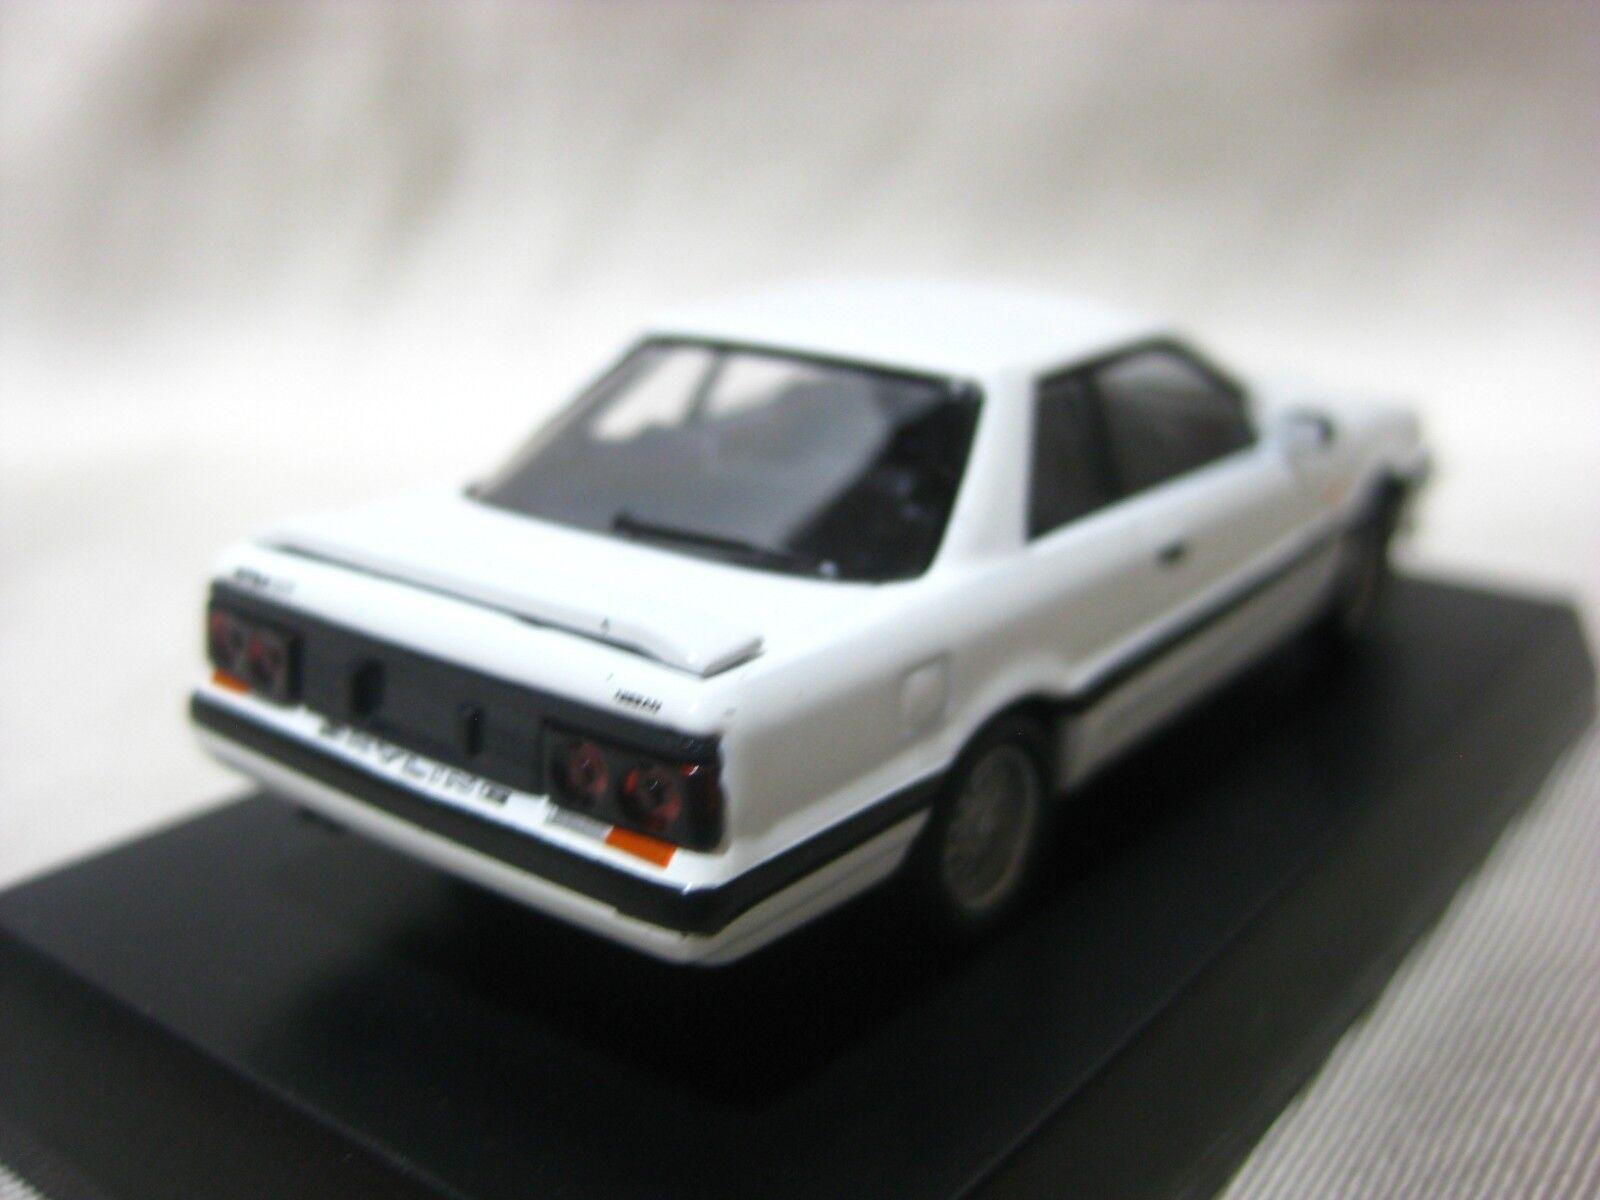 1 64 Kyosho SKYLINE 2000 GTS-X White NISSAN Diecast Diecast Diecast Model Car 805d8f